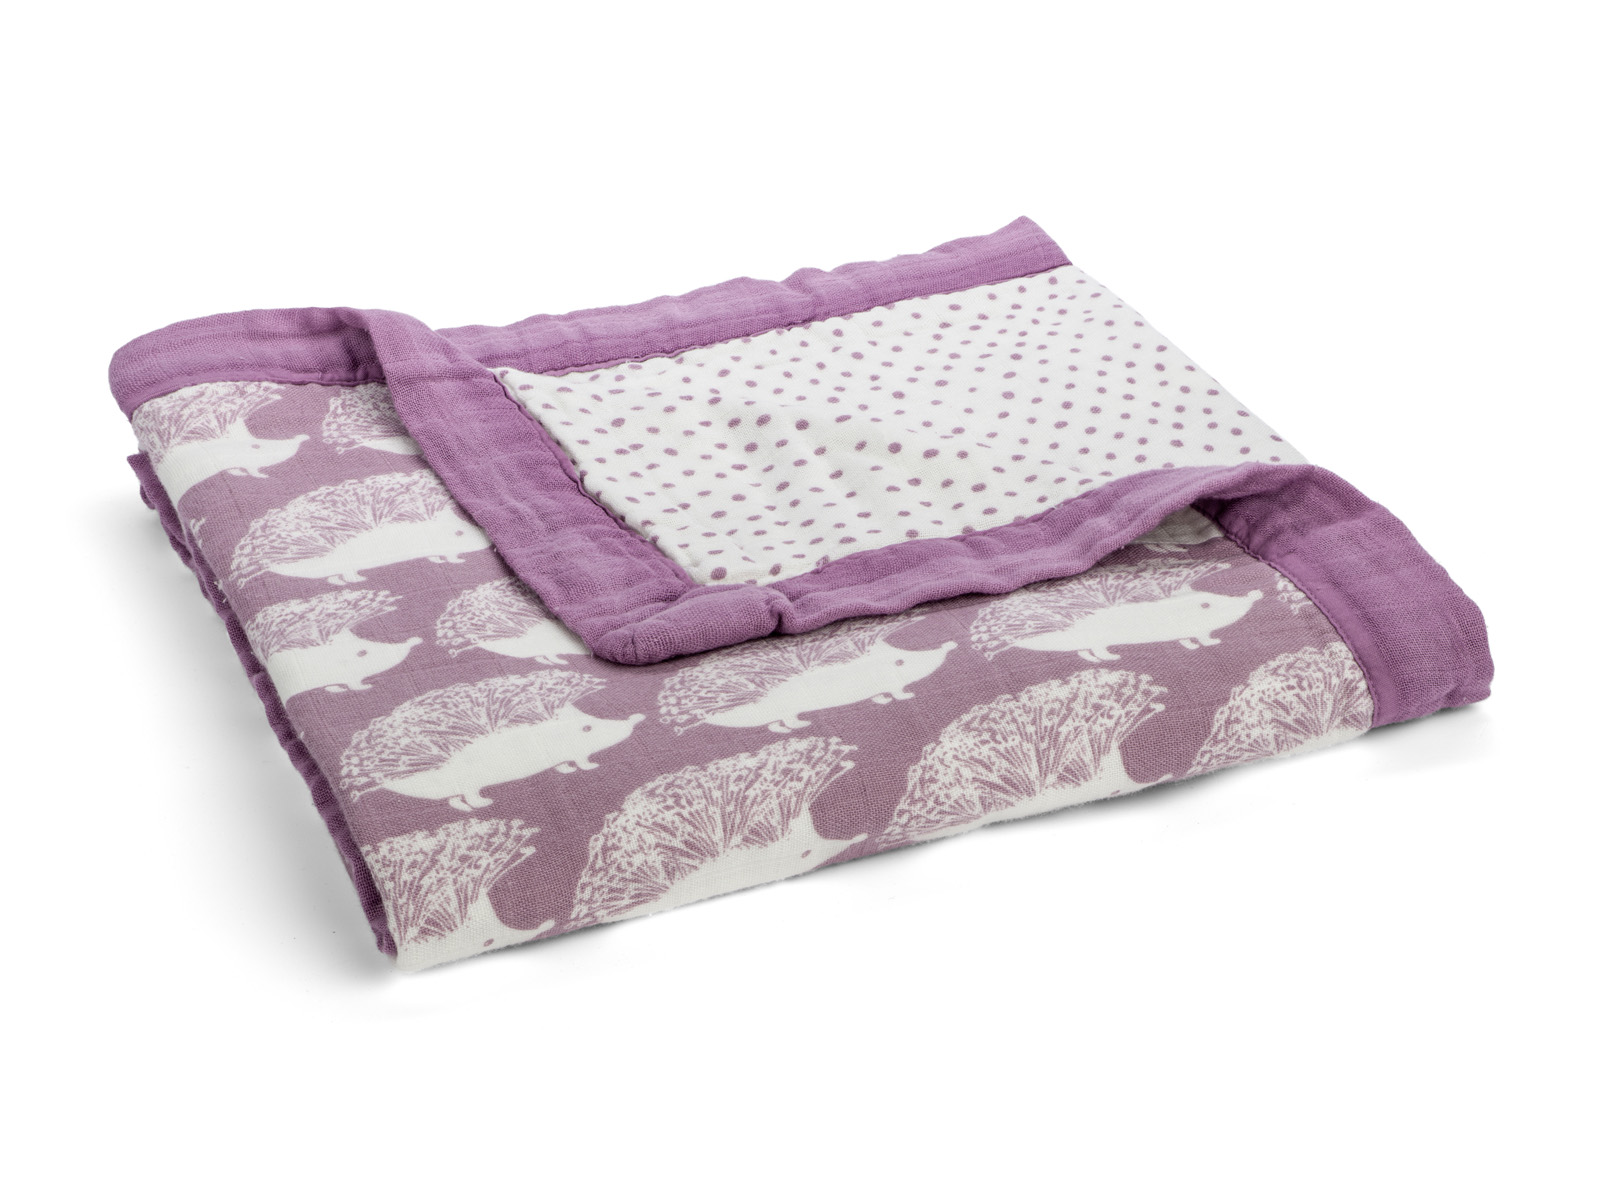 milkbarn big lovey baby kuscheldecke babydecke 90 x 90 cm igel lila. Black Bedroom Furniture Sets. Home Design Ideas